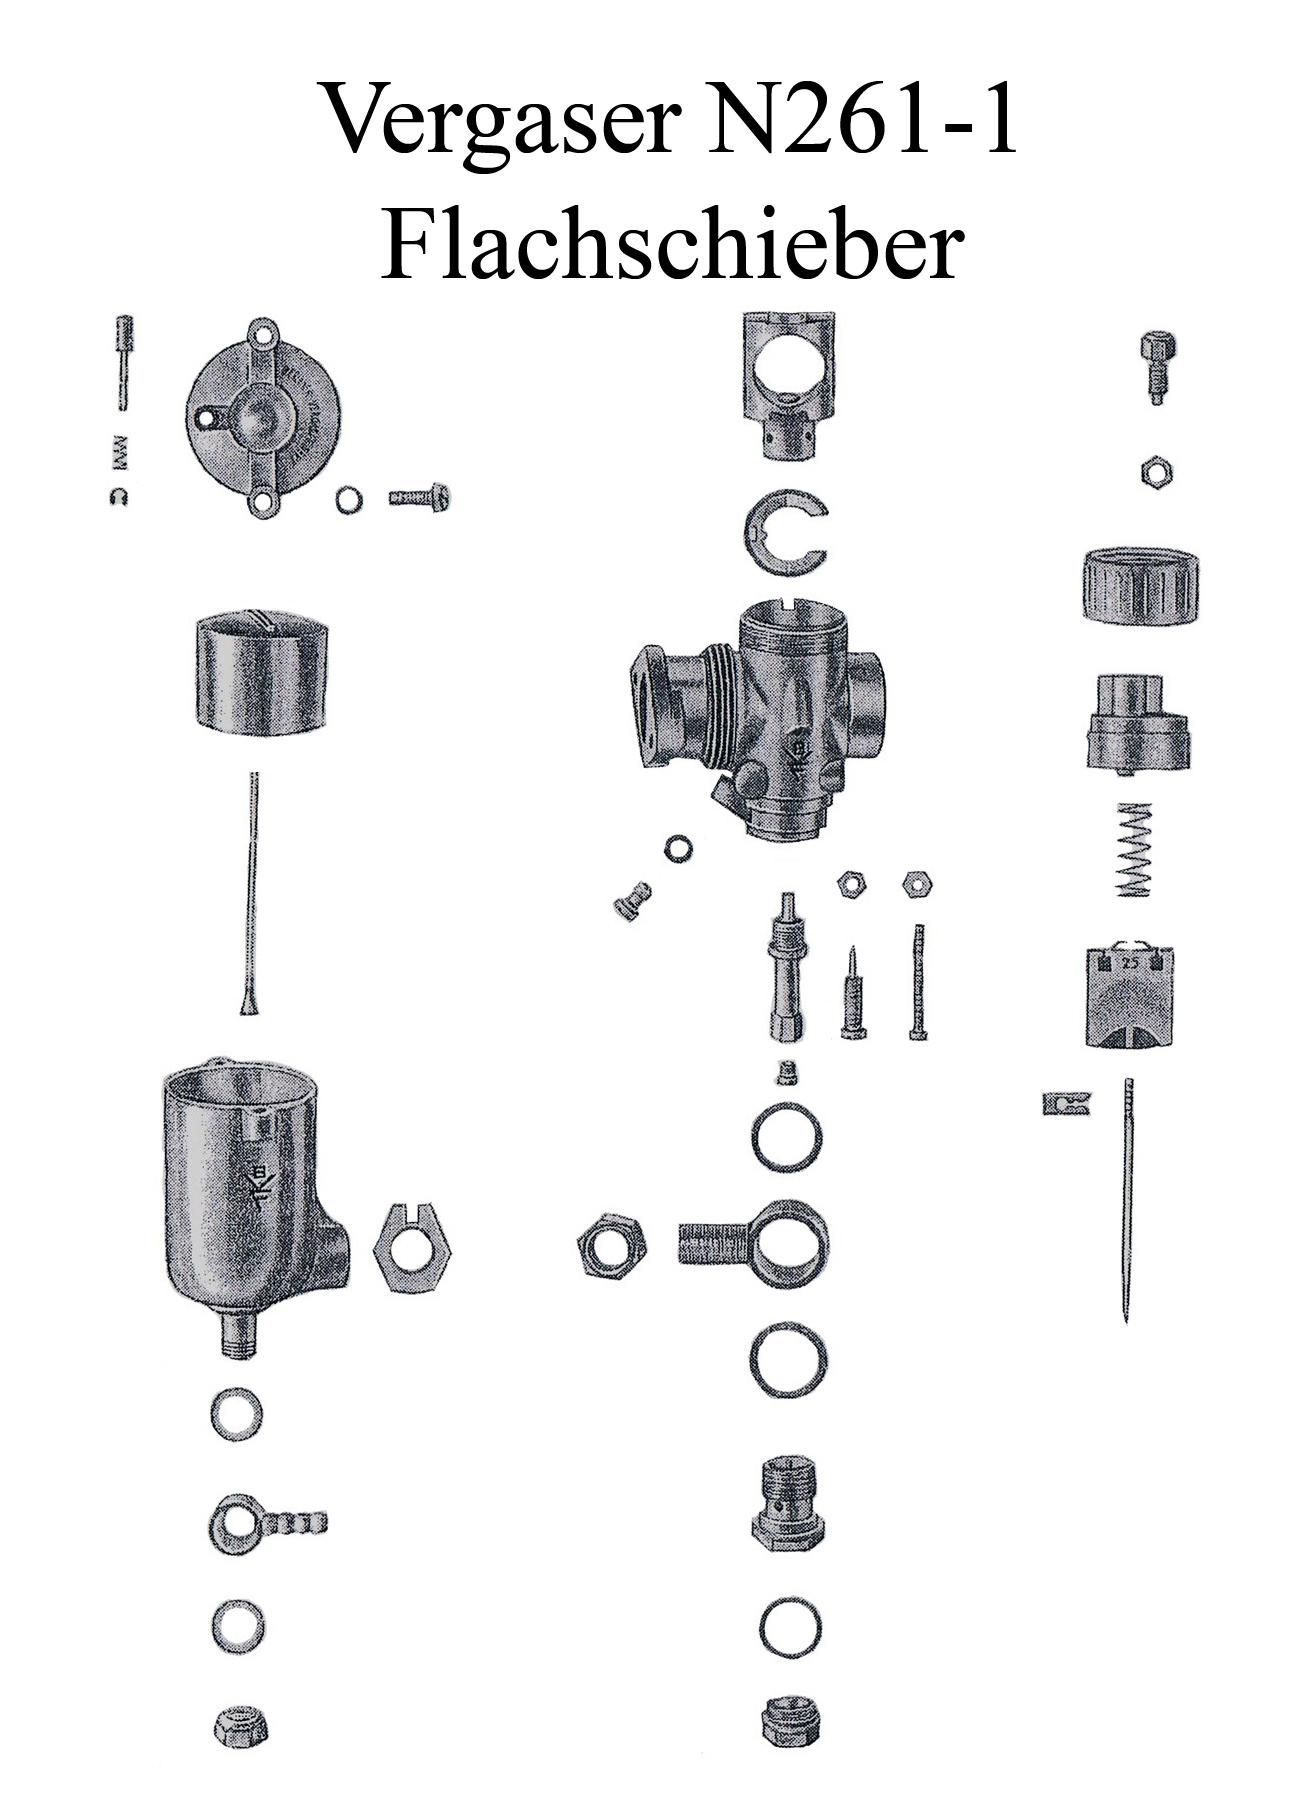 DDR-Motorrad Sport AWO BVF Flachschiebervergaser N261 Düse Dichtung Schwimmernadel Schieber Reparaturset